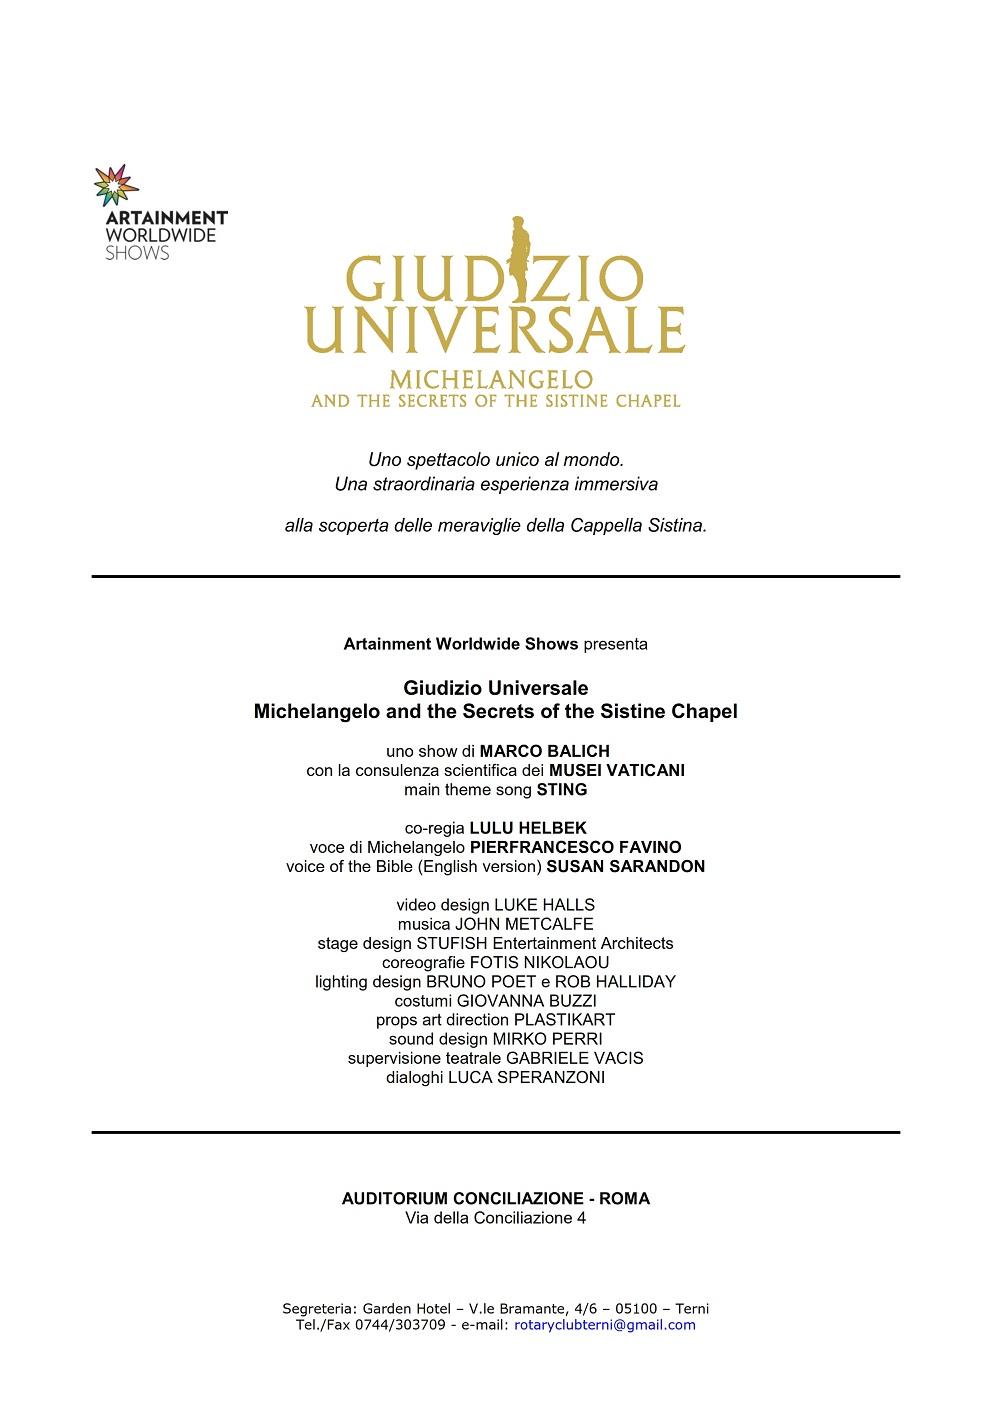 2018_10-RC Terni-Programma Ottobre 2018_003